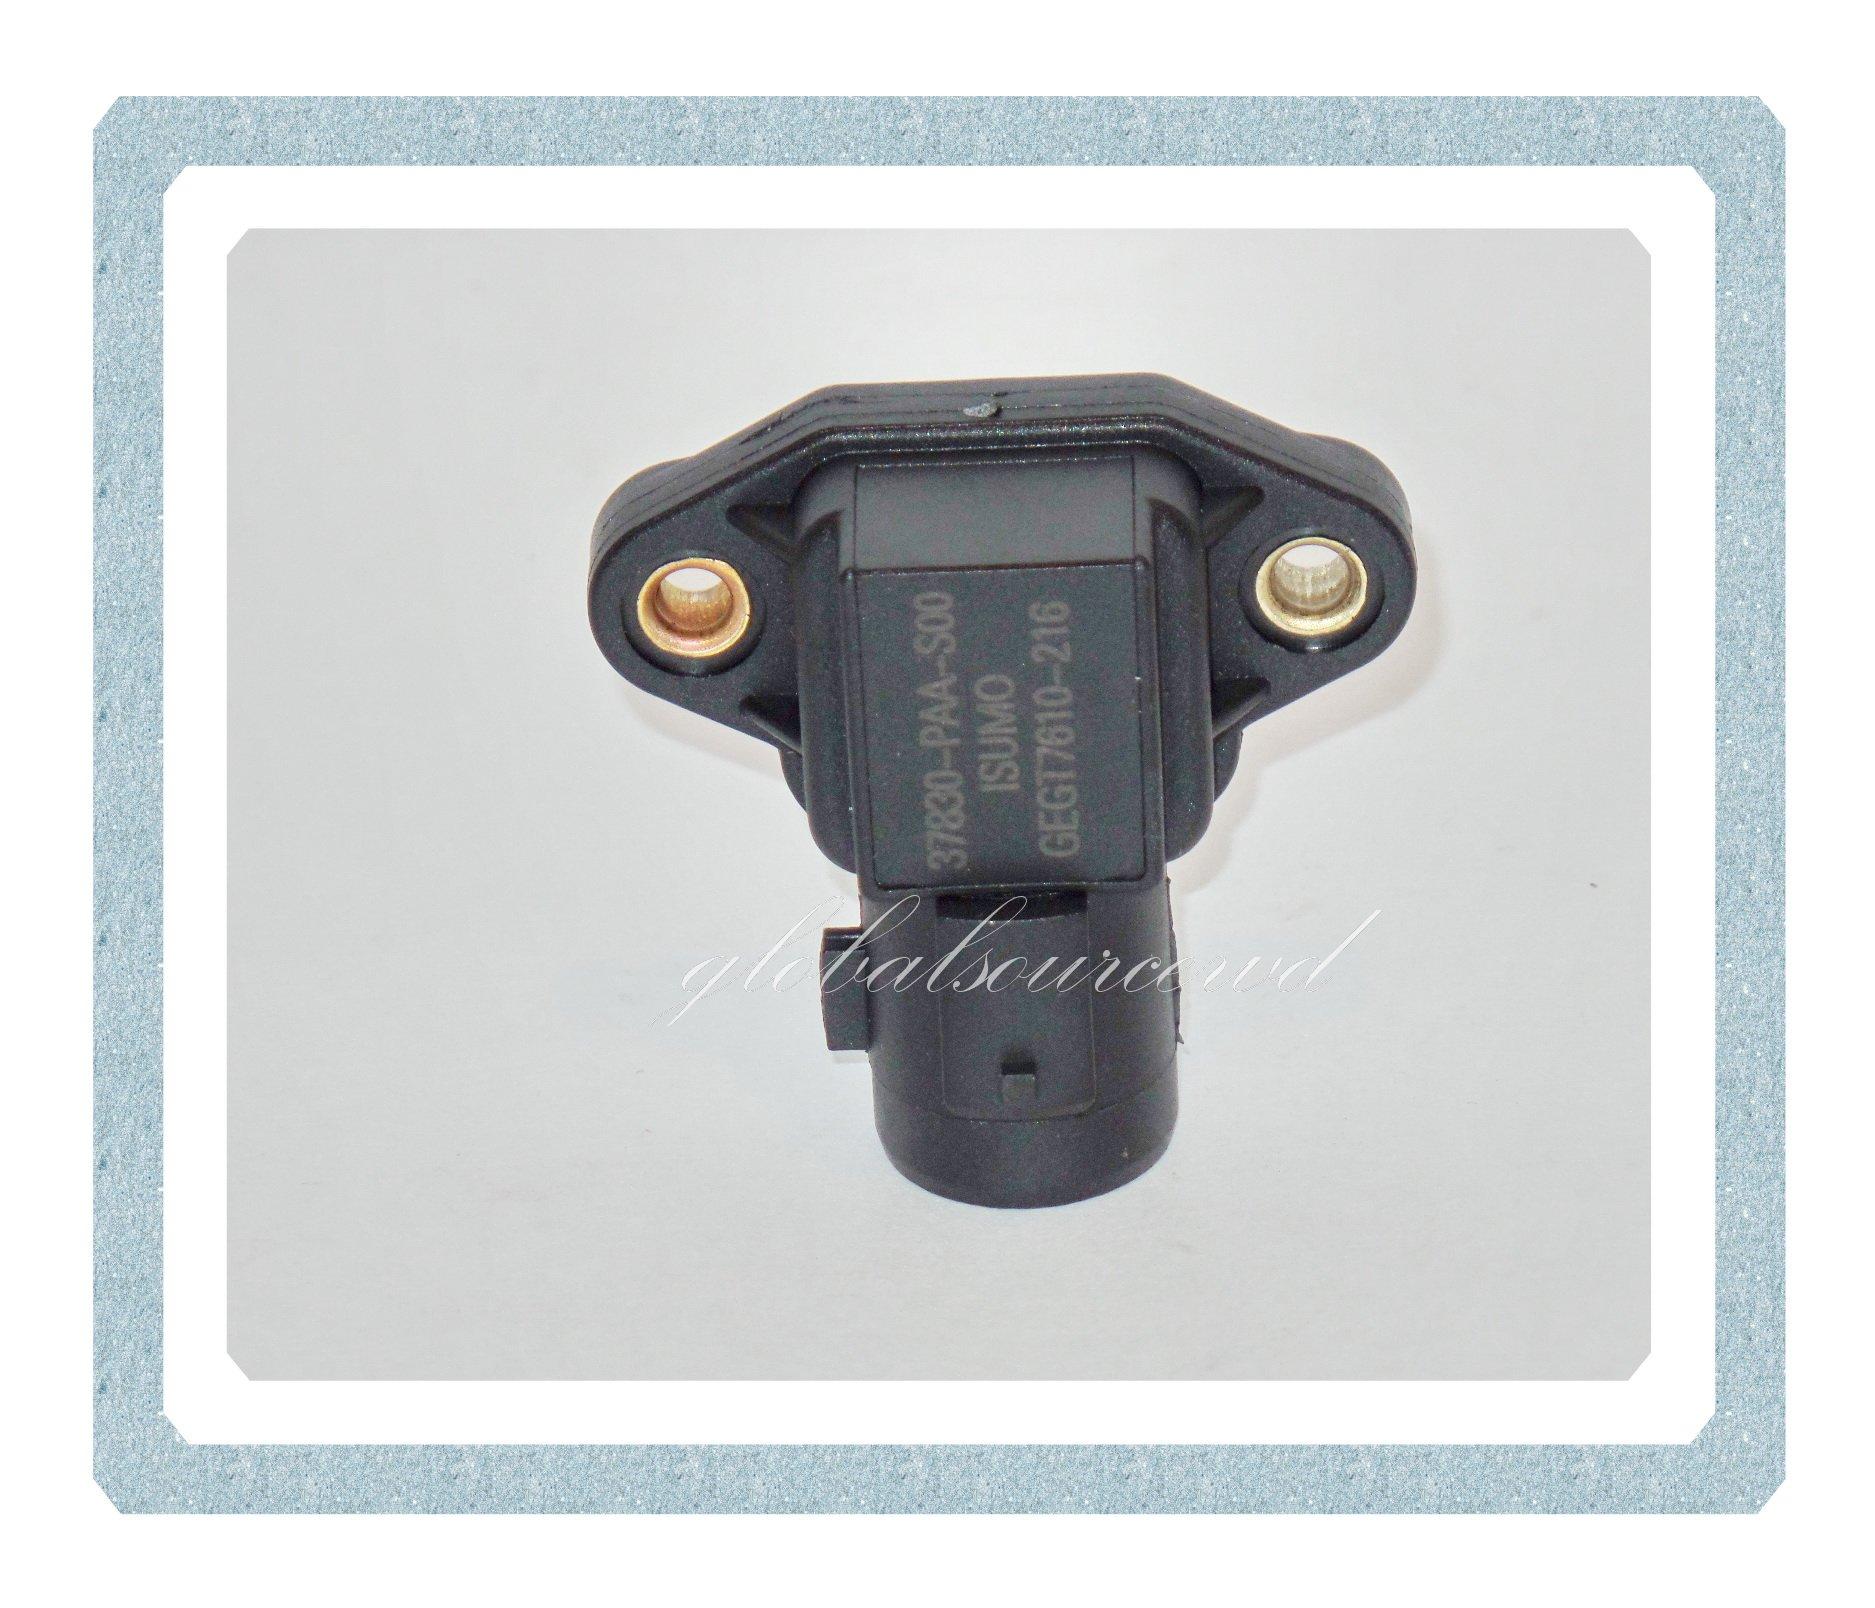 37830-PAA-S00 MAP Sensor Fits: Acura Cl 97-99, Integra 94-01,TL 99, Honda Acoord 94-02,Civic Del Sol 93-97,CR-V 97-01,Odyssey 95-97,Prelude 9601 S2000 00-05,Isuzu Oasis96-99